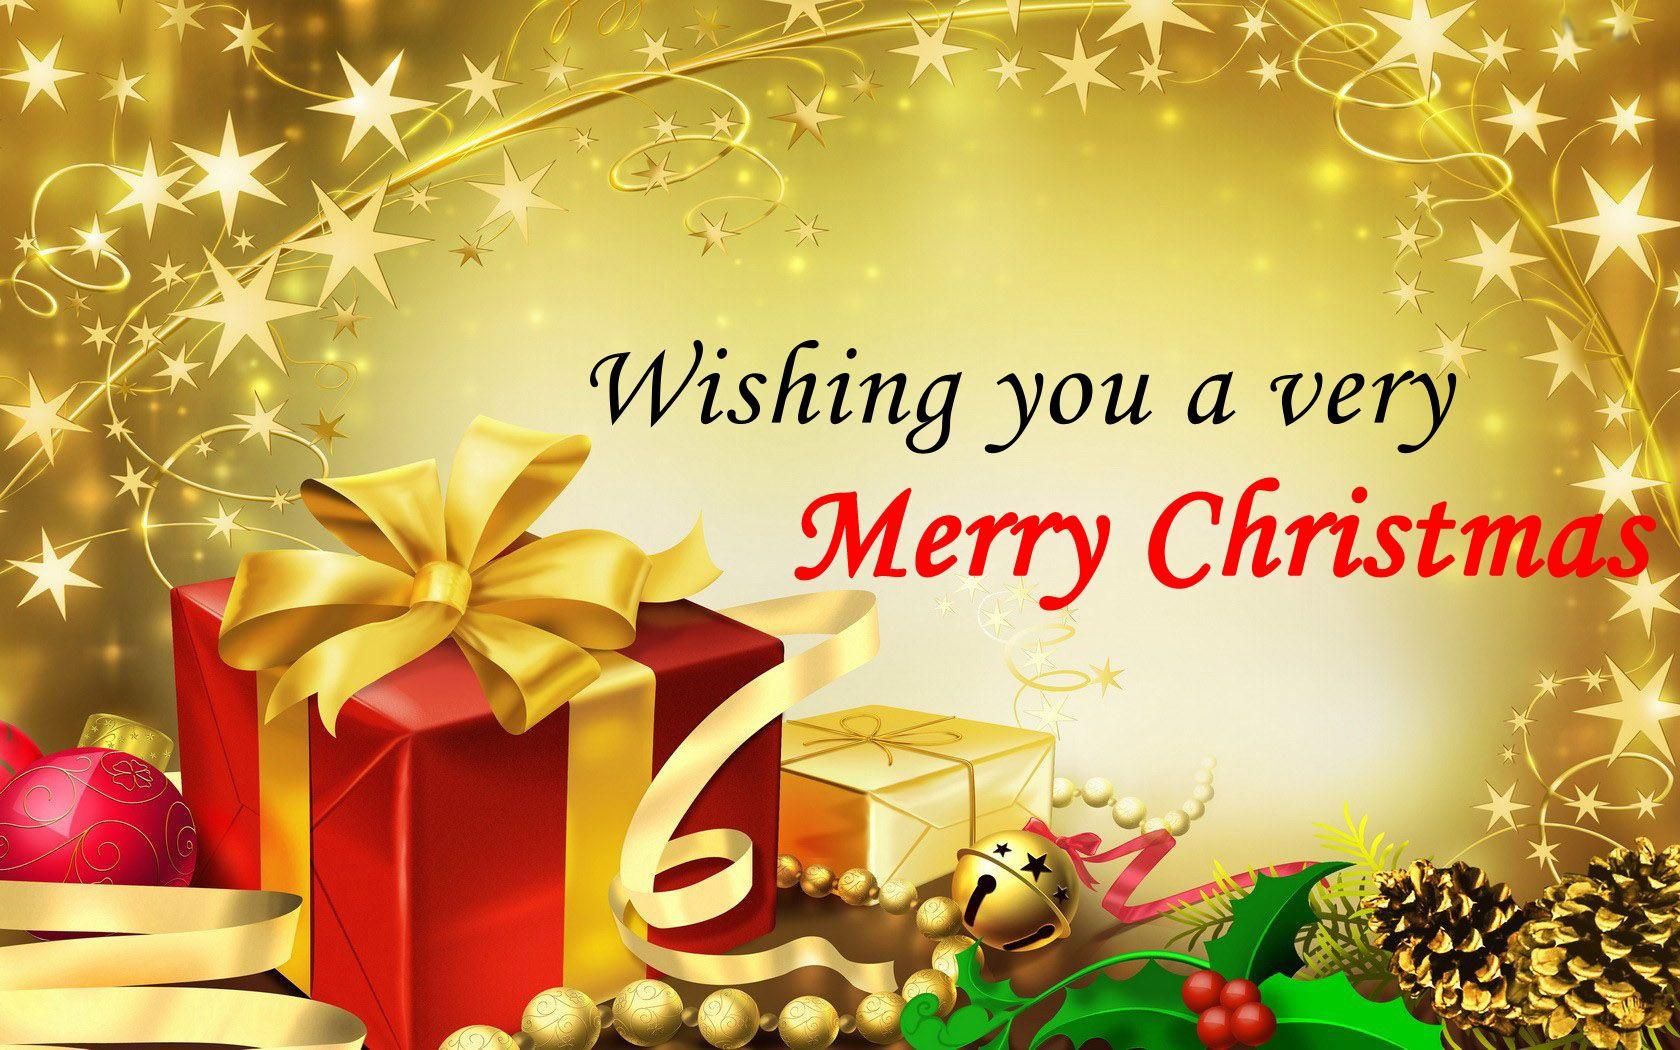 Christmas Greetings 017 Christmas Greetings Pinterest Merry